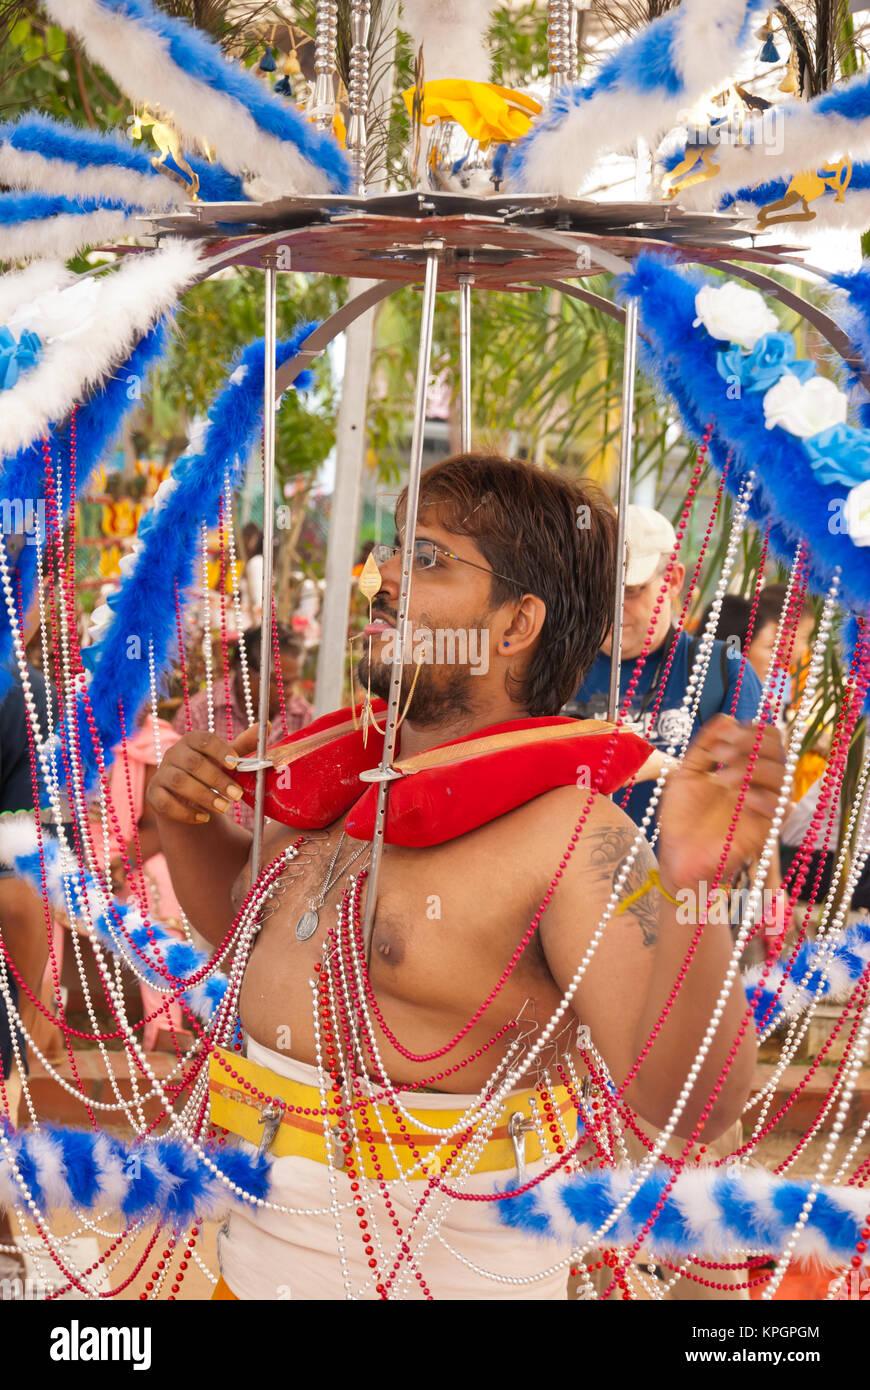 Singapur - Januar 30: Hindu devotee eine schwere an Thaipusam kavadi am 30 Januar, 2010 in Singapur. Stockfoto